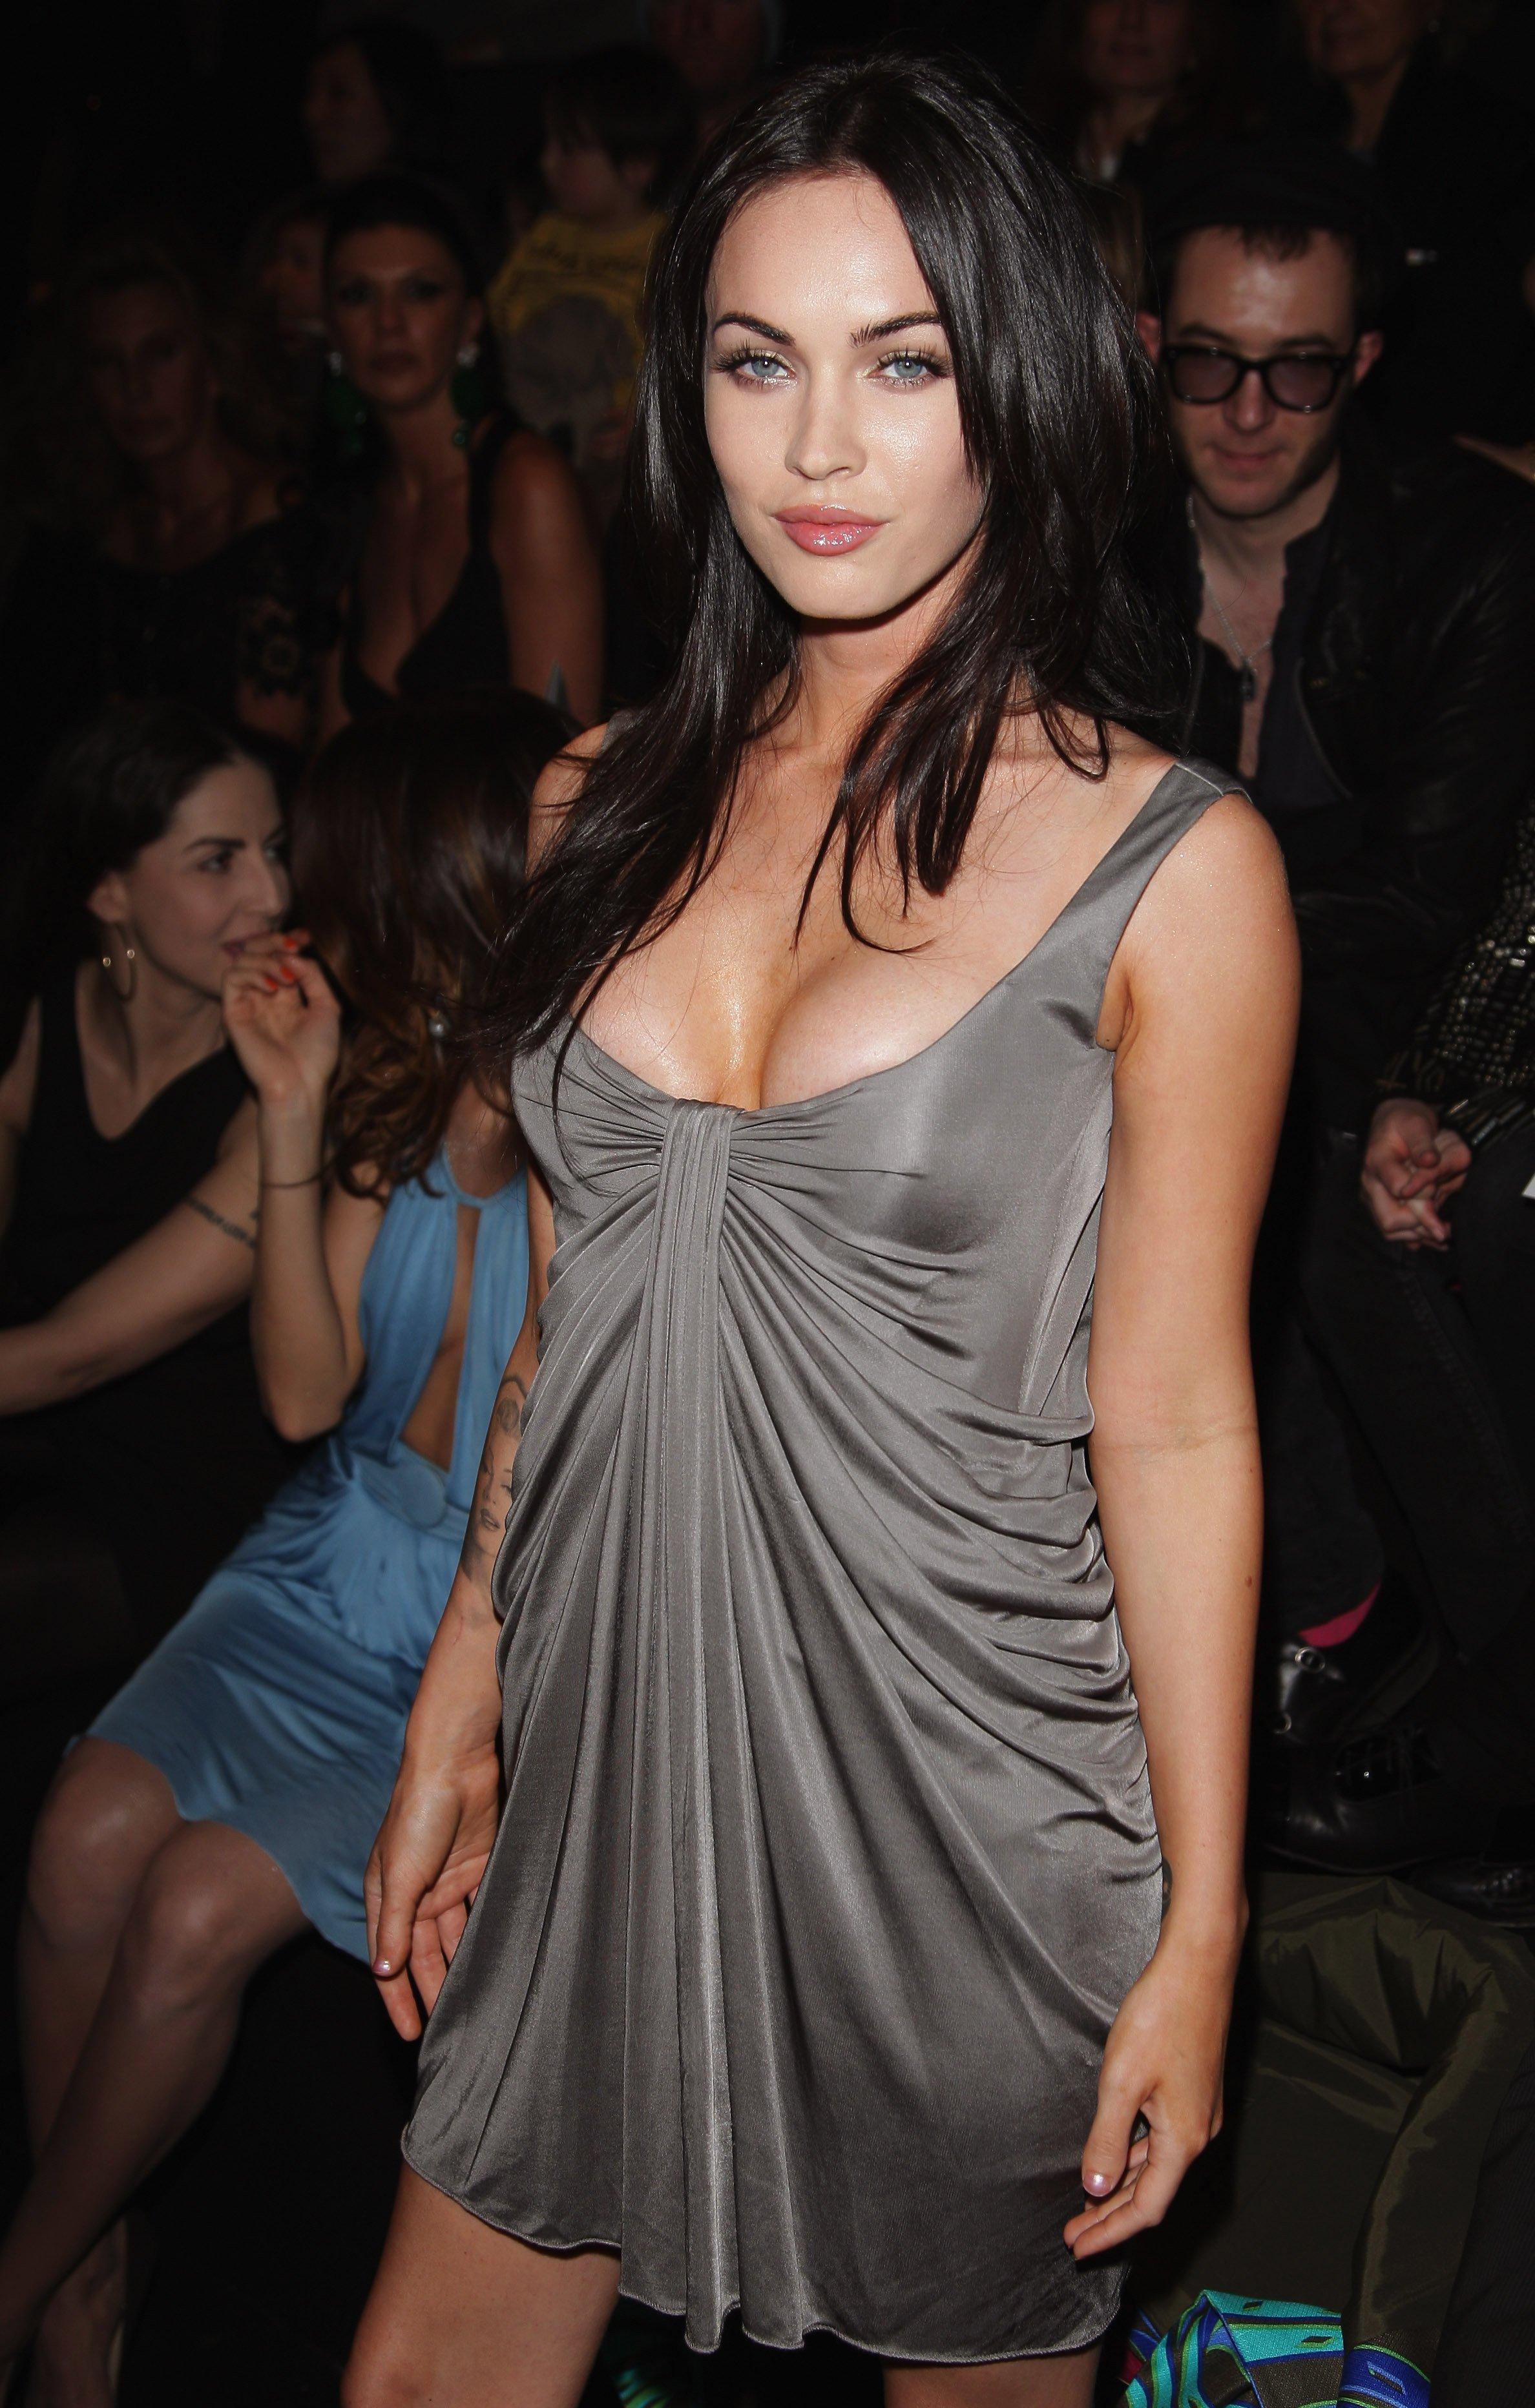 Megan Fox Pussy Pics & HUGE Nude Wank Collection!